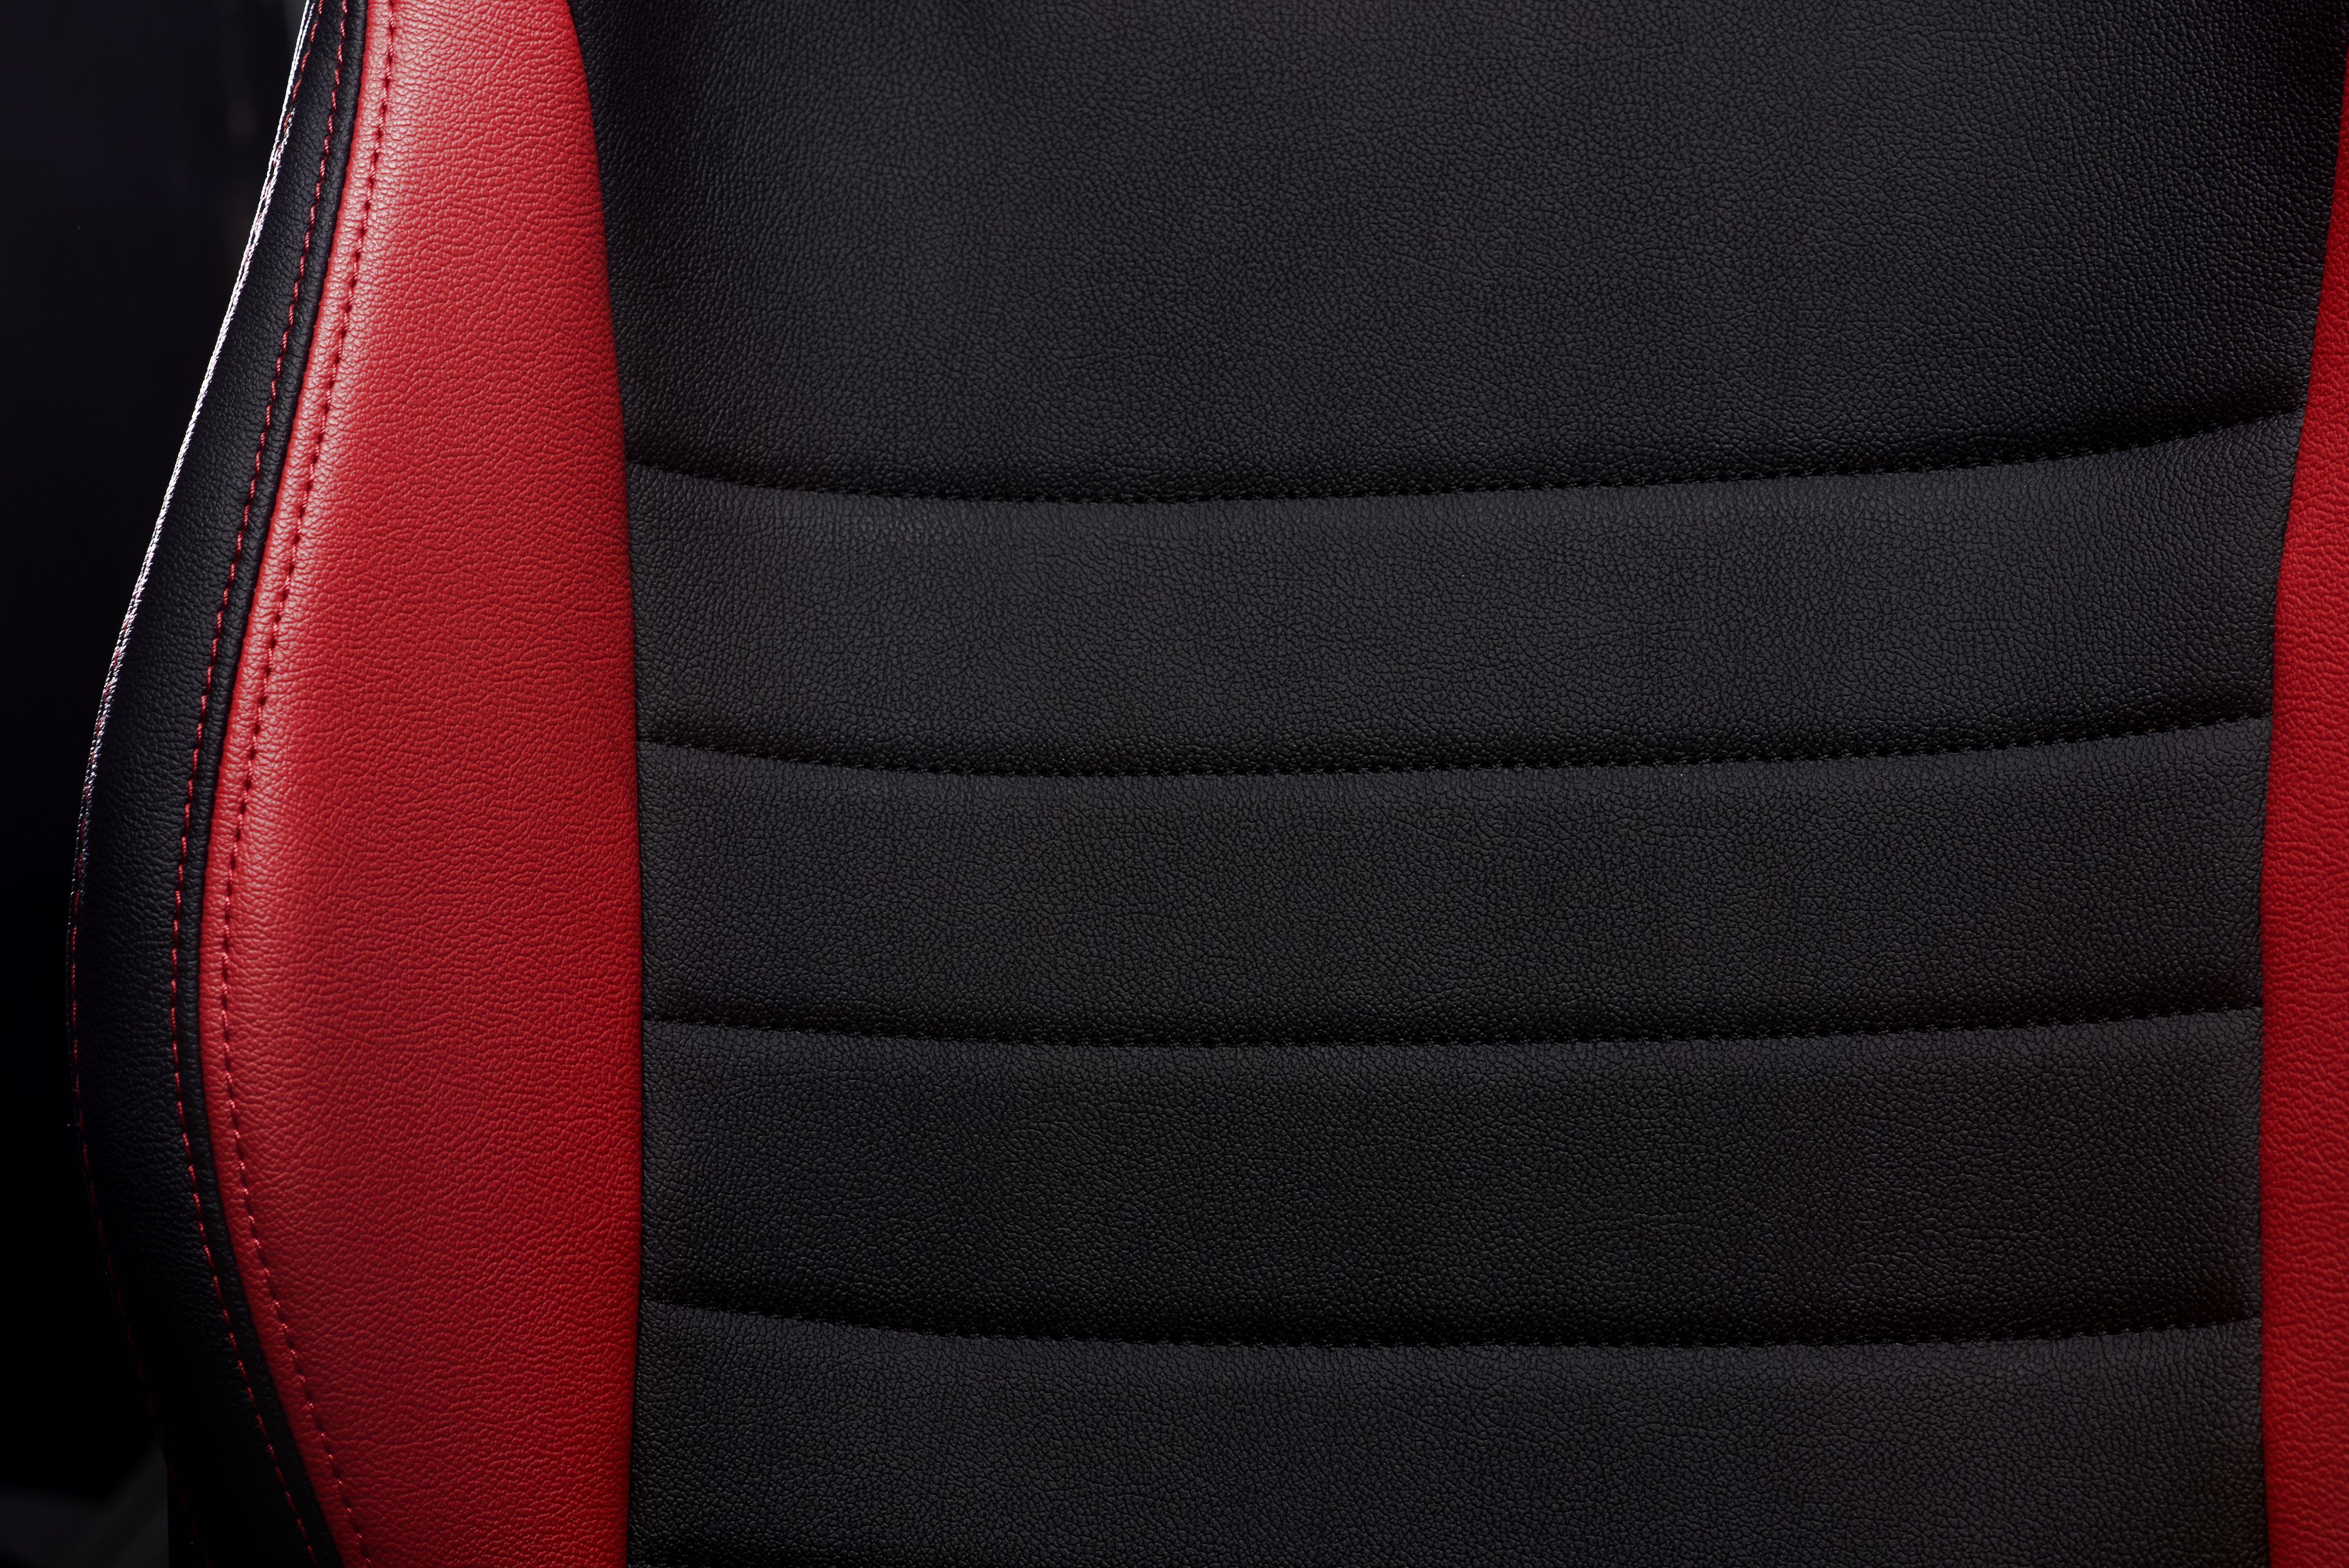 VERTAGEAR SL4000 Lines & Textures Wellness design